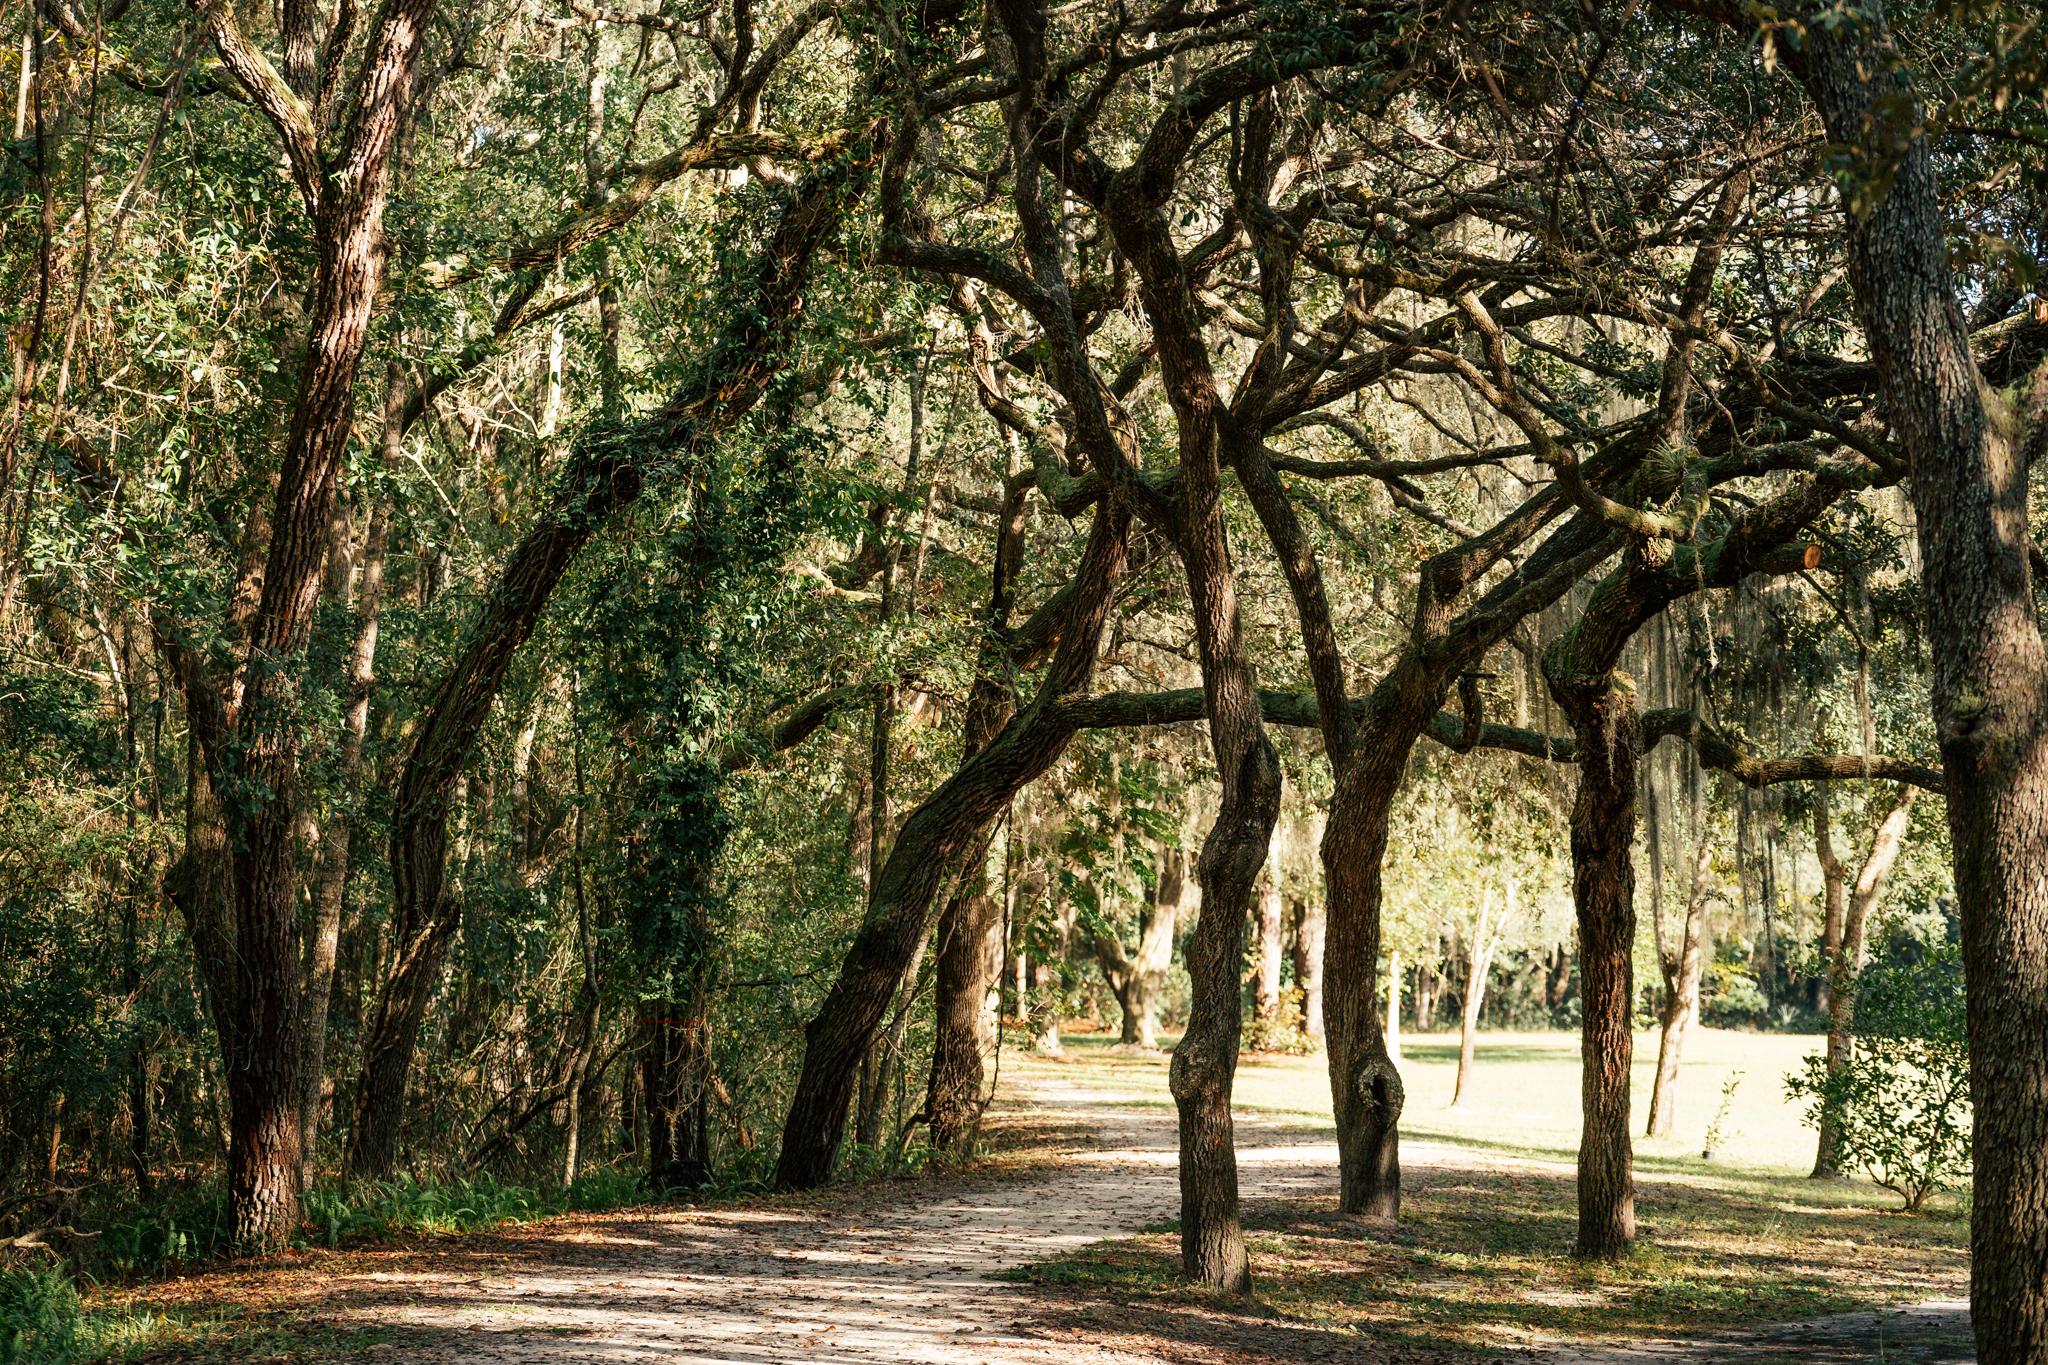 green acres nature park -